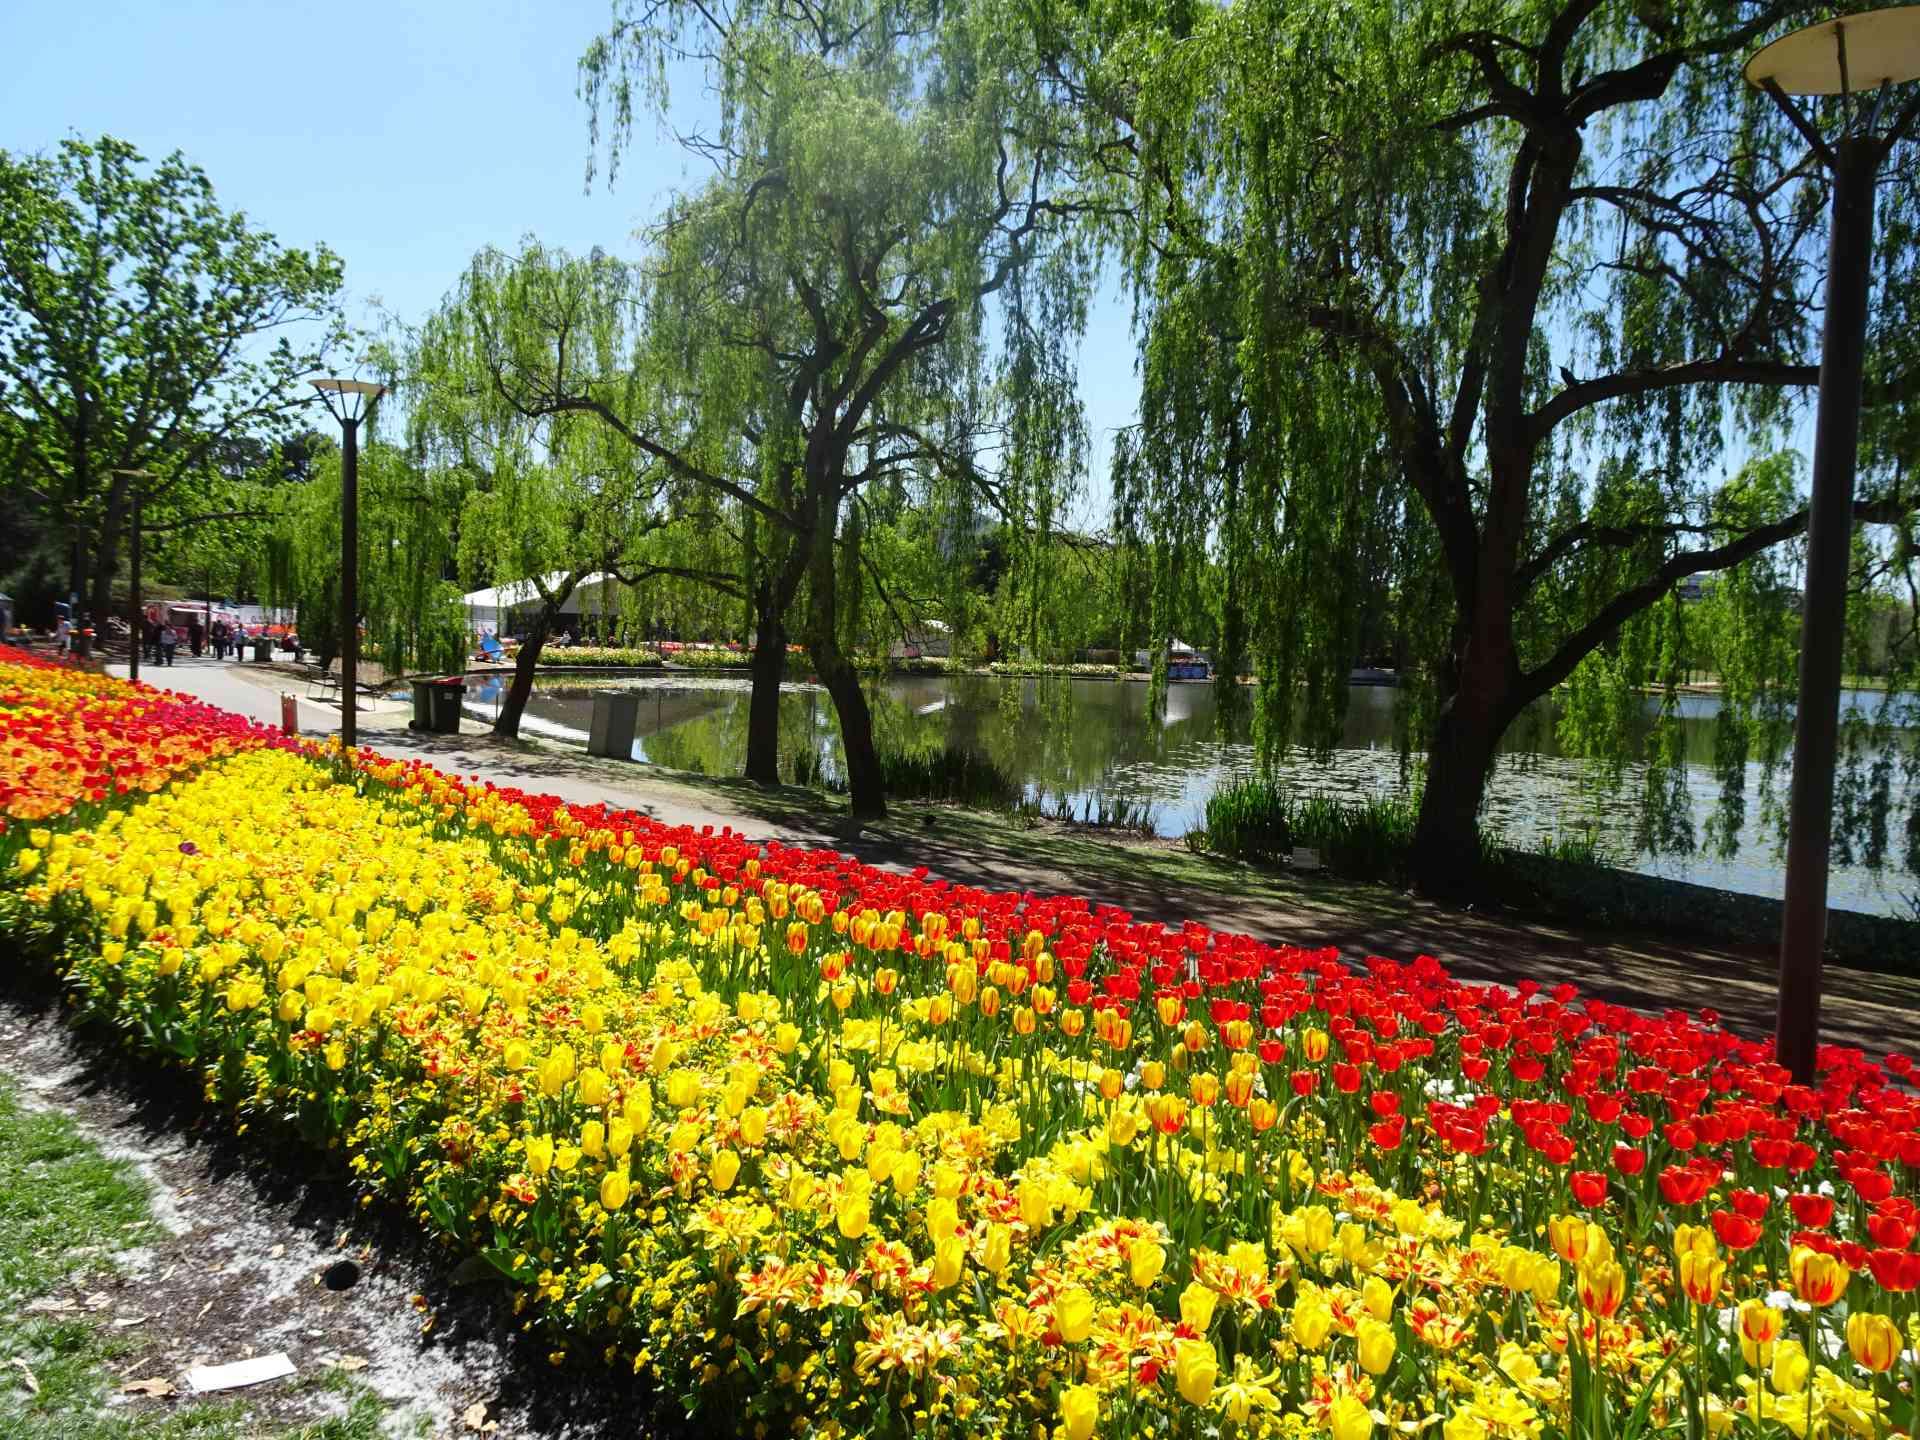 The Floriade Flower Festival Departures